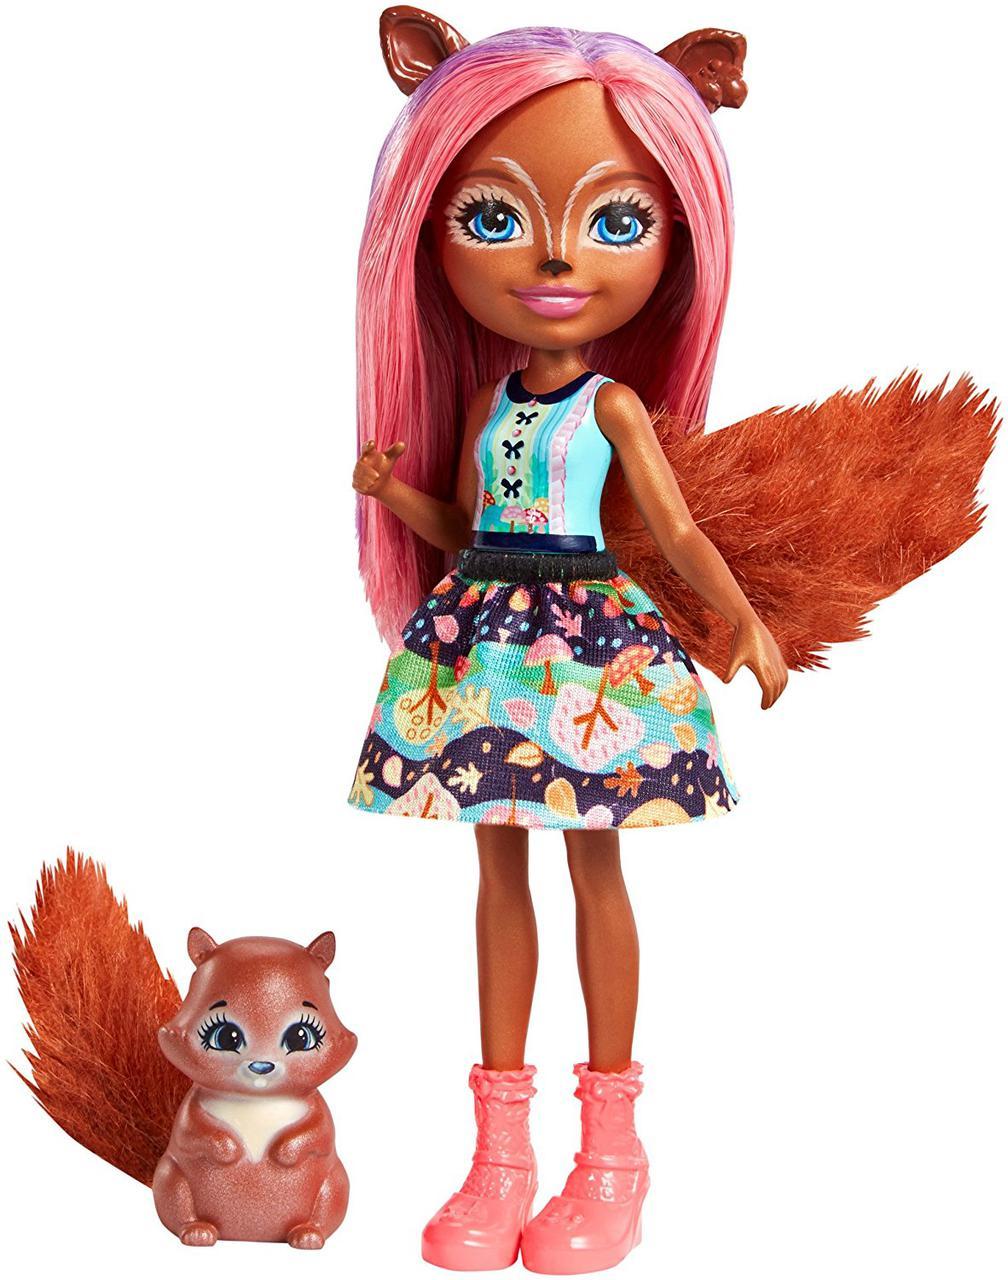 Кукла Энчантималс Белка Санча и бельченок Стампер / Enchantimals Sancha Squirrel Doll & Stumper